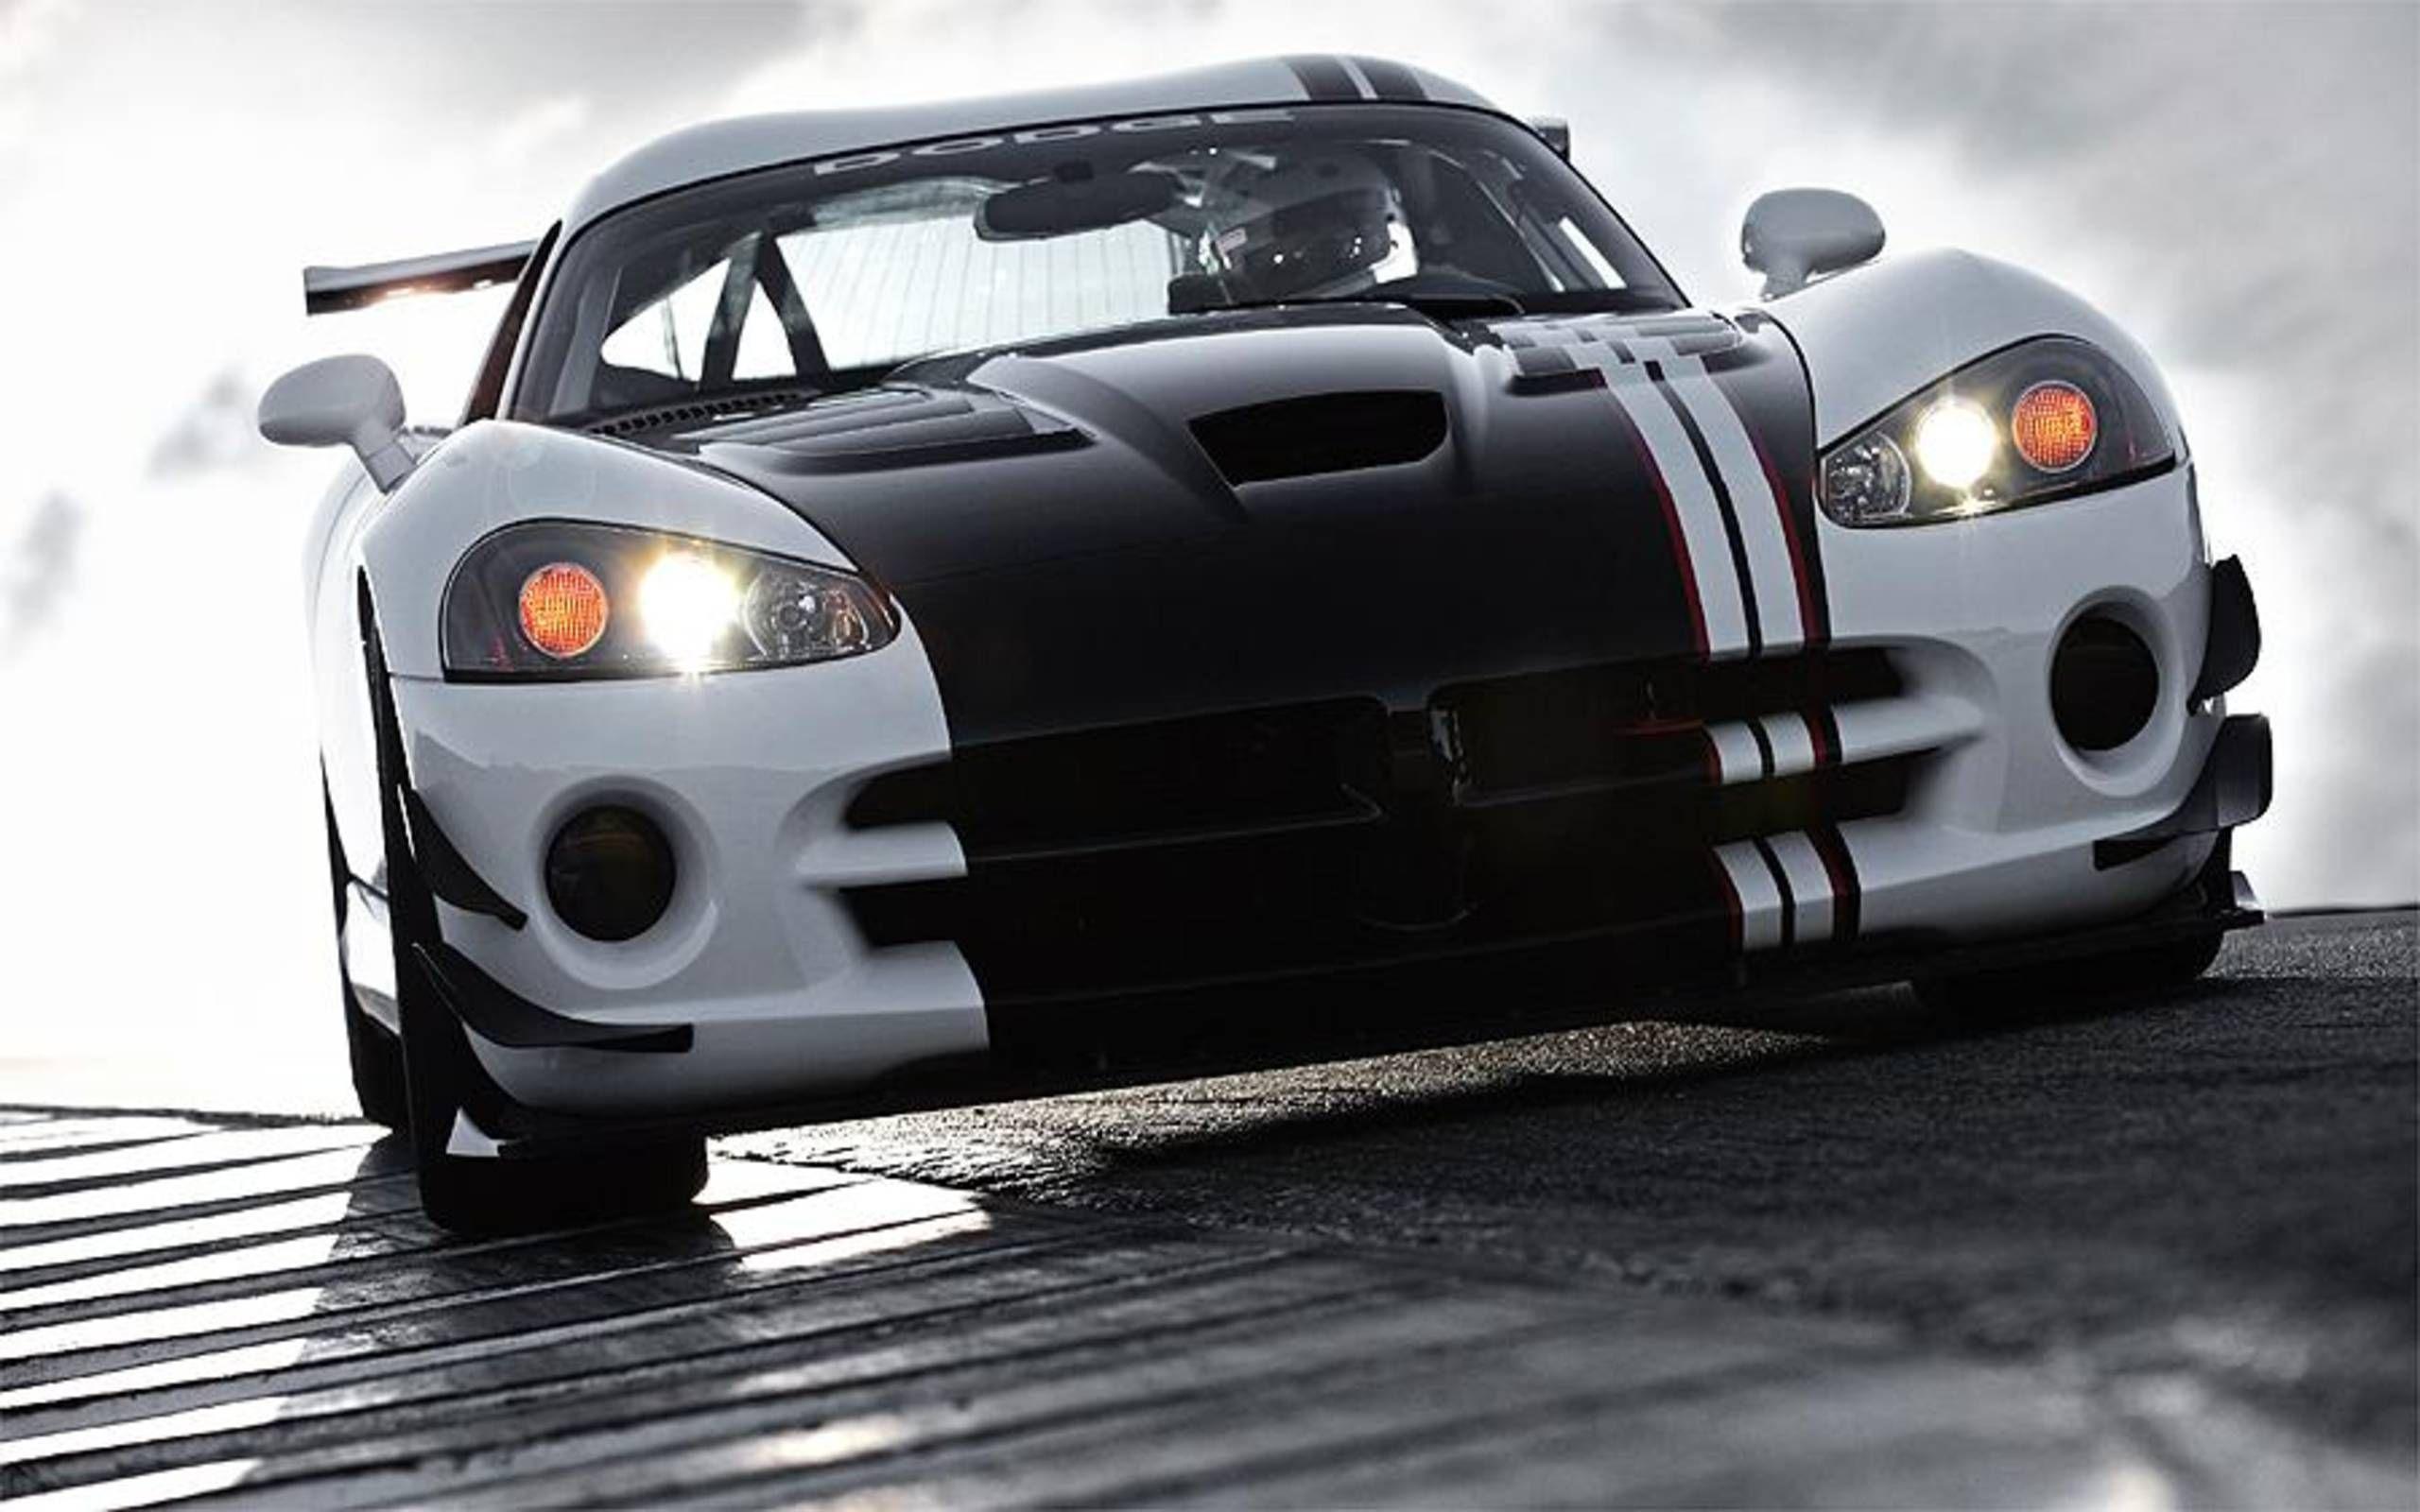 2010 Dodge Viper Srt10 Acr X Rolls Into Production In Detroit